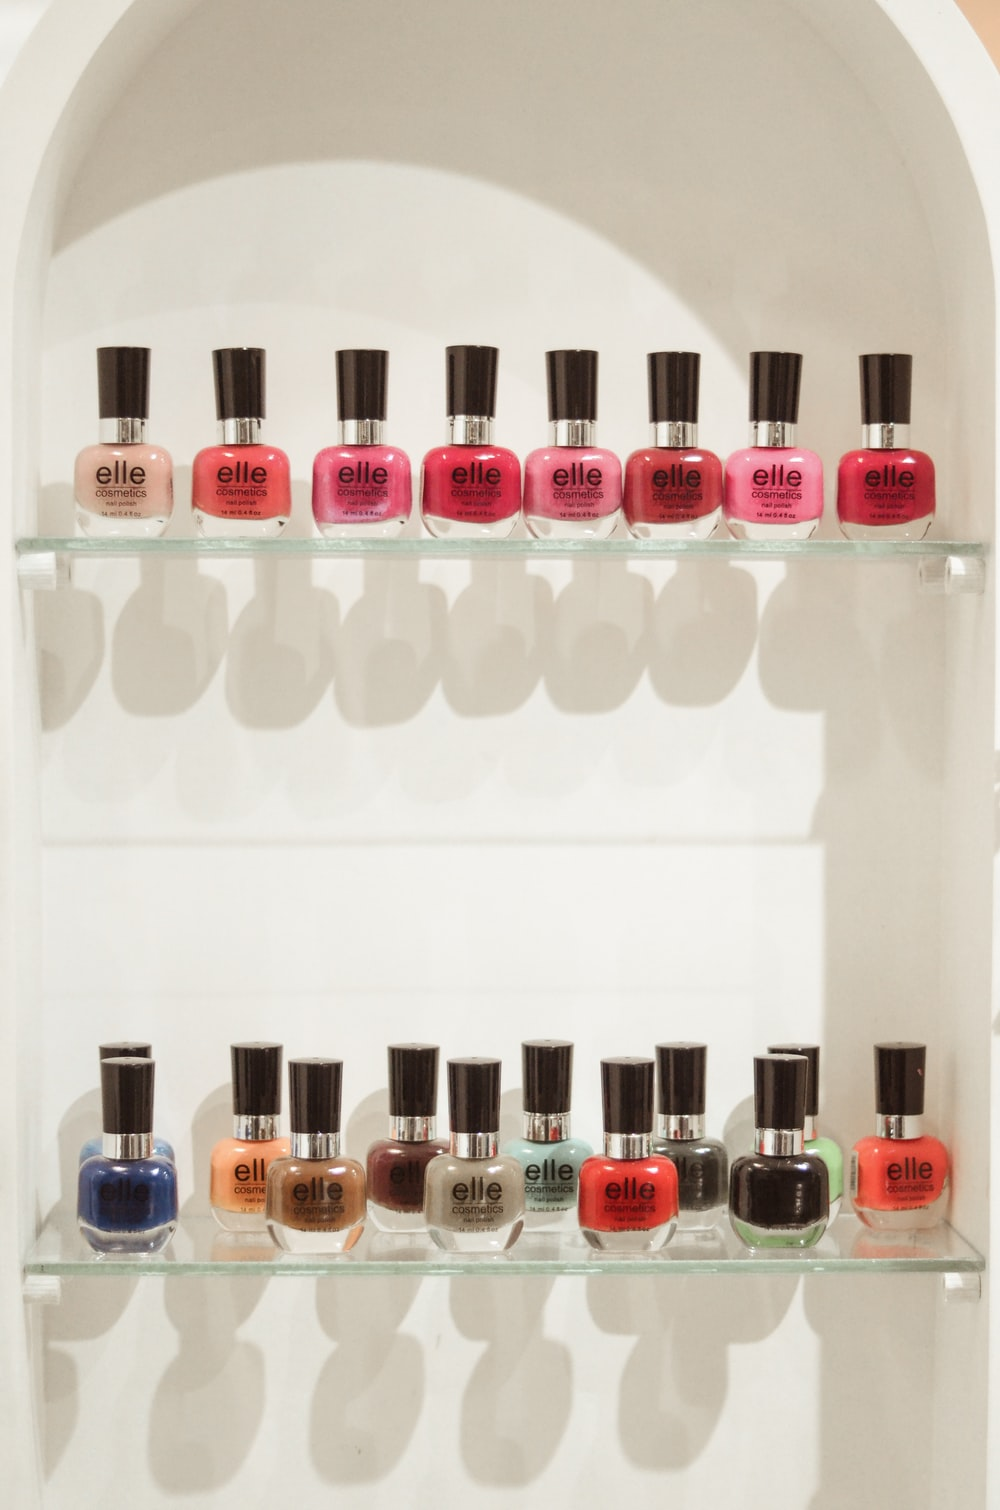 assorted nail polish bottles on white shelf